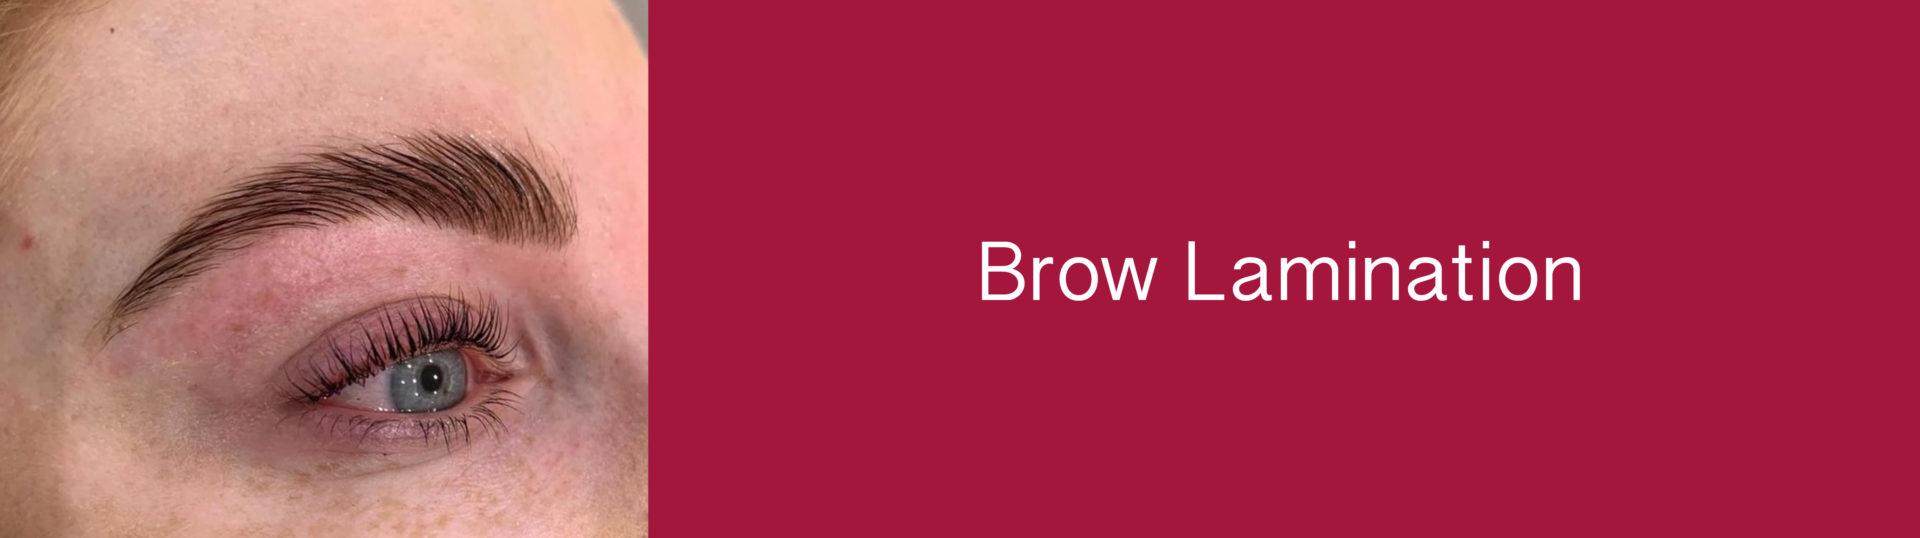 Brow Lamination whitley Bay Salon